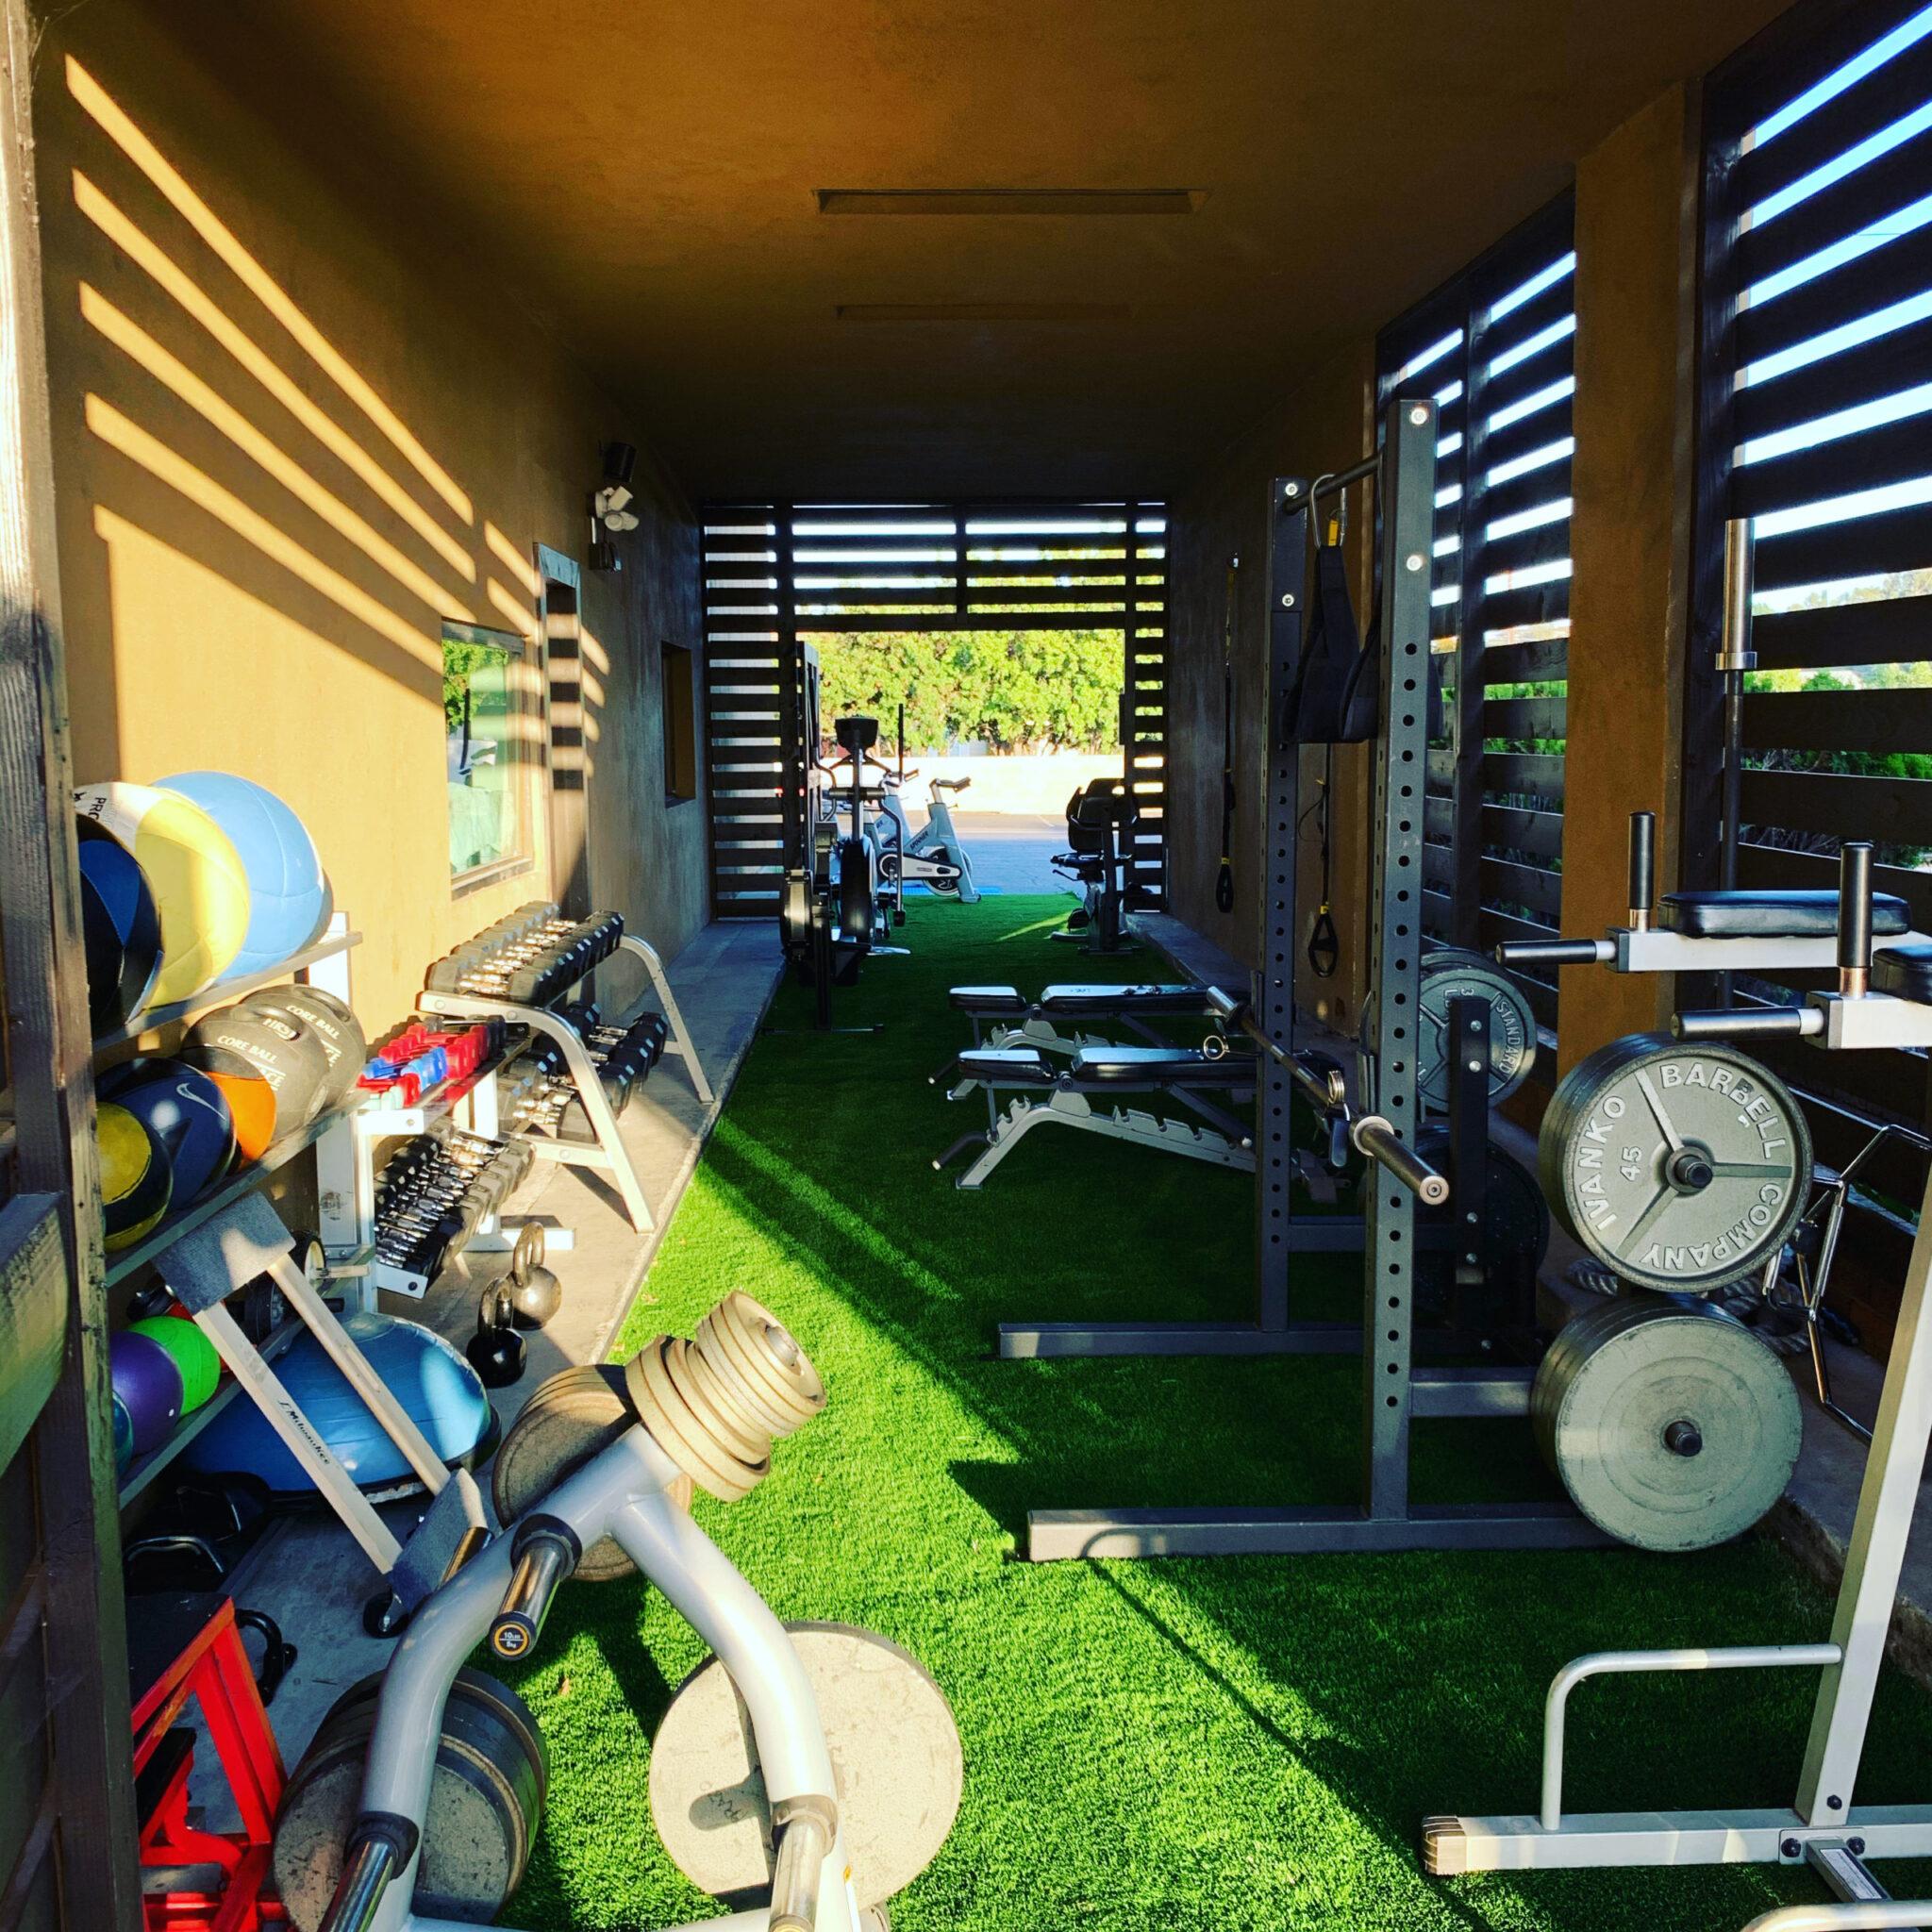 Outdoor Workout Gym Space TruSelf Sporting Club San Diego Gym